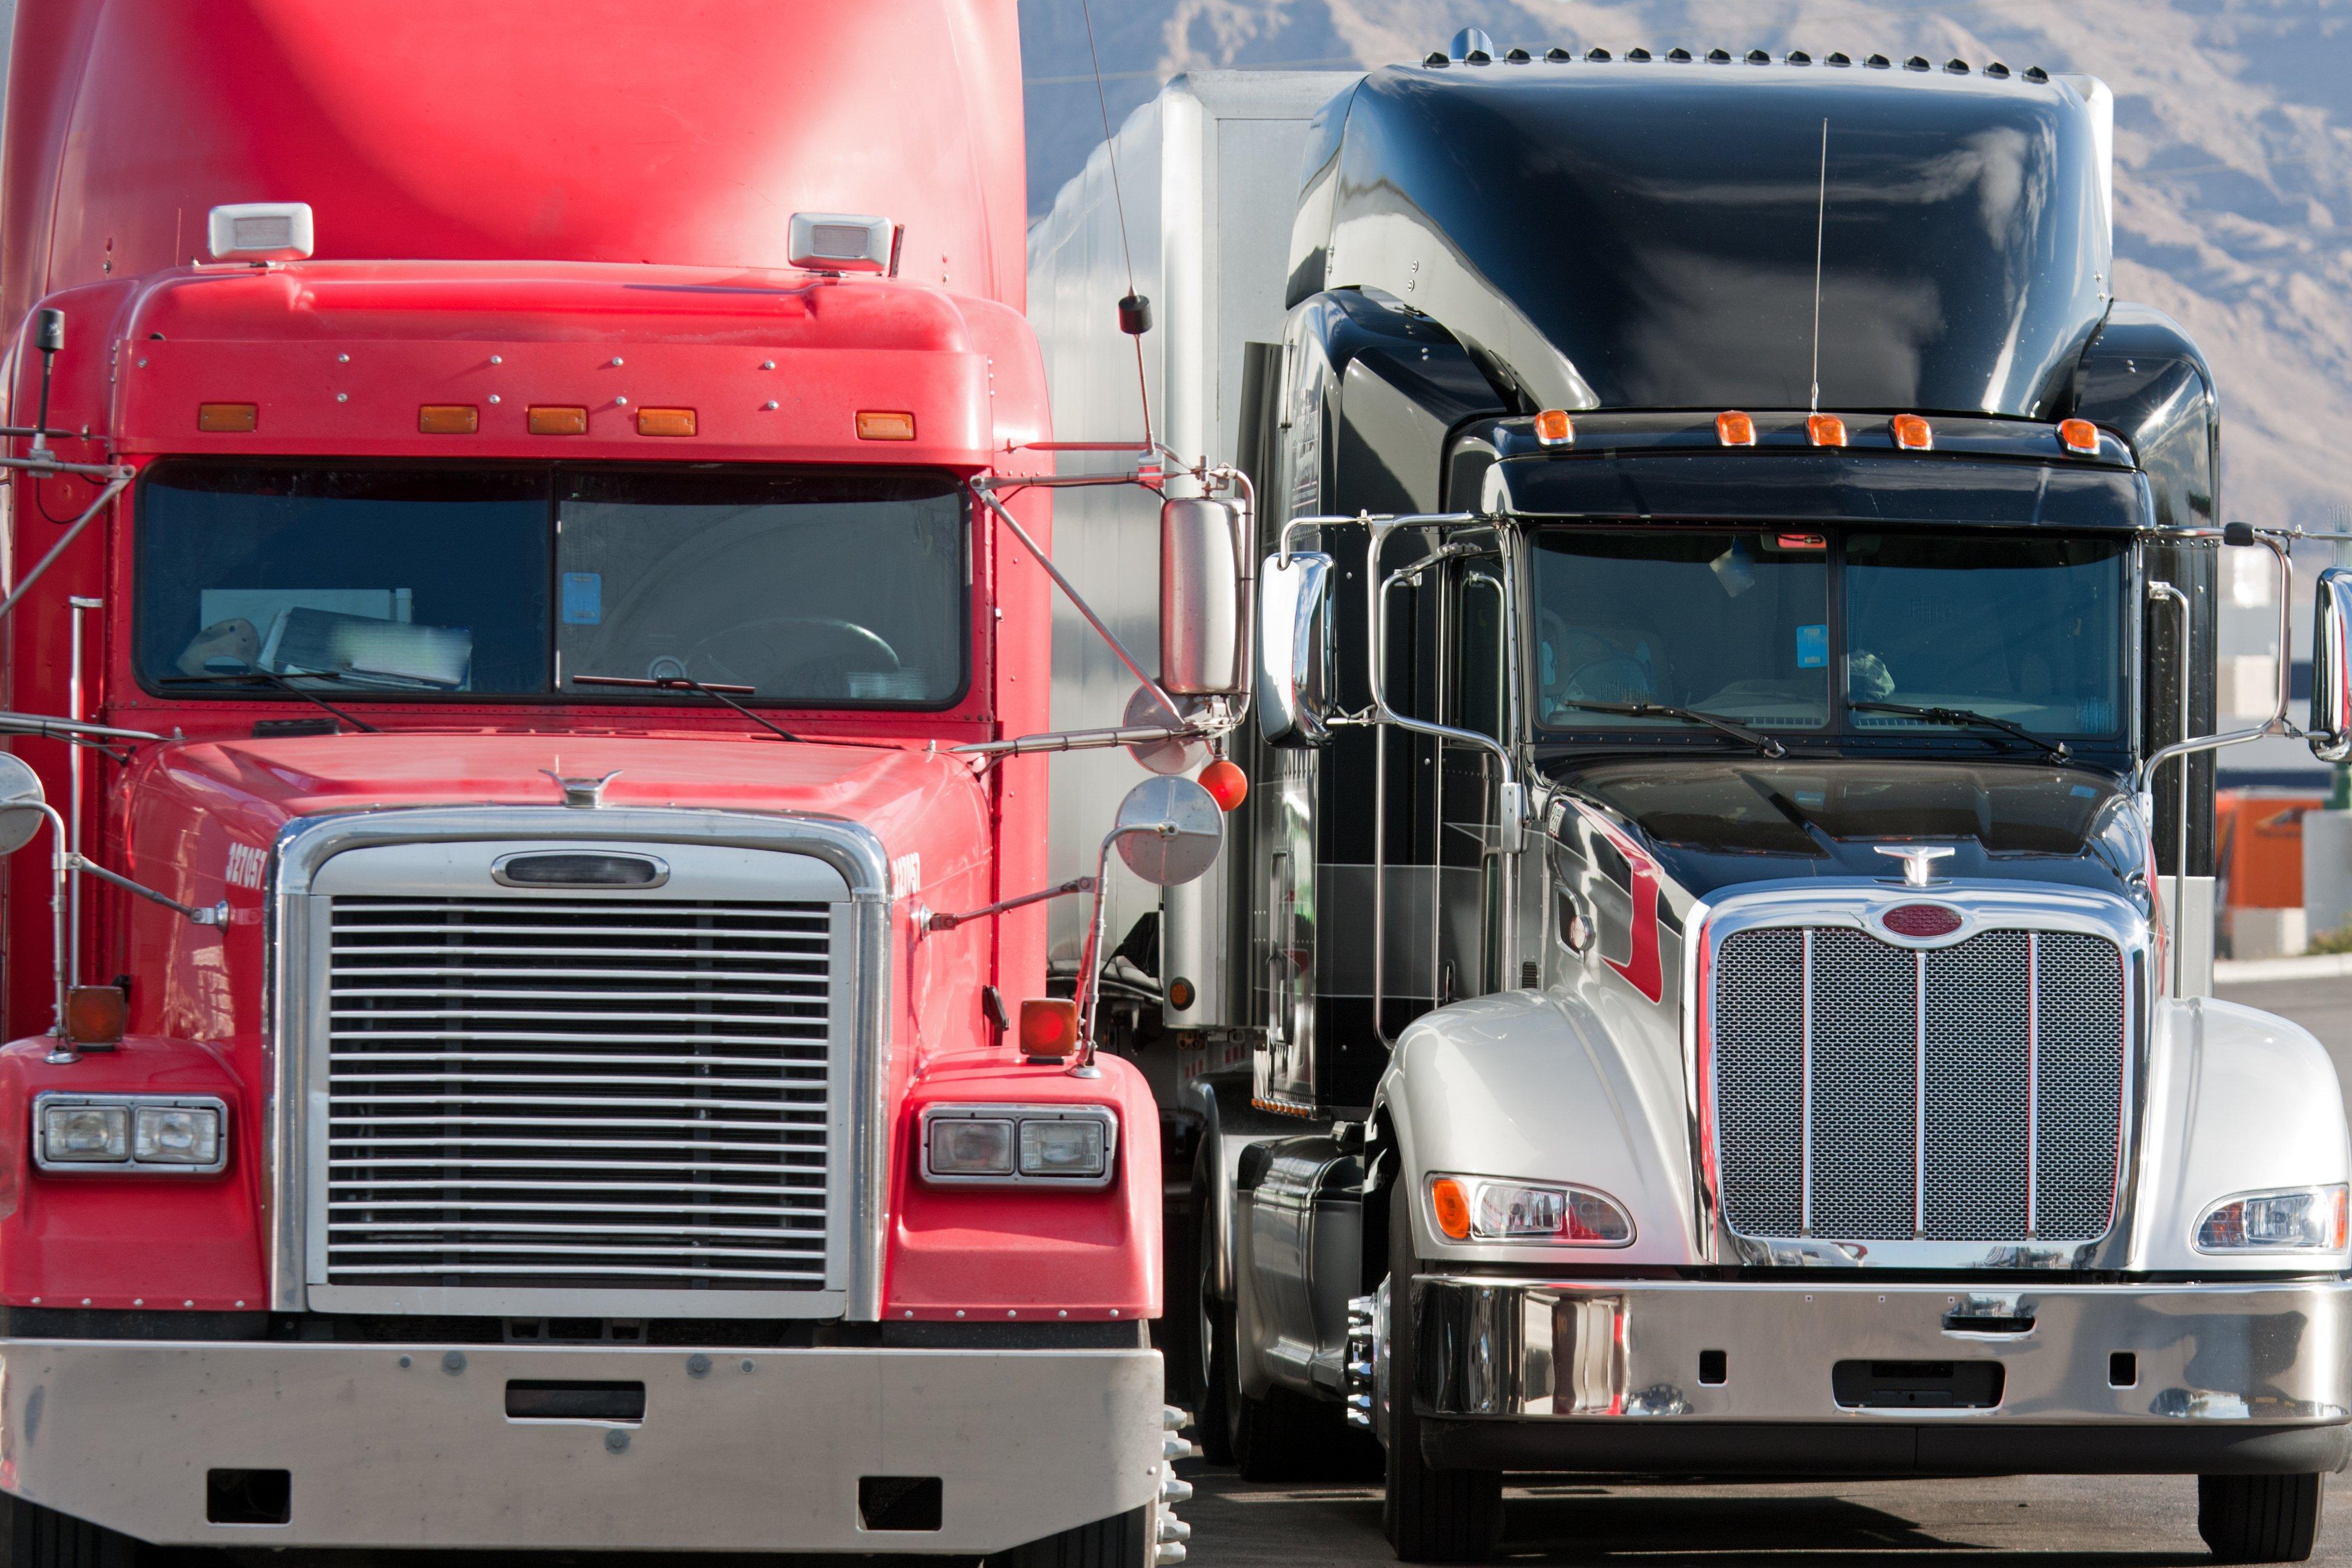 2 Trucks Bristol Webpage Home